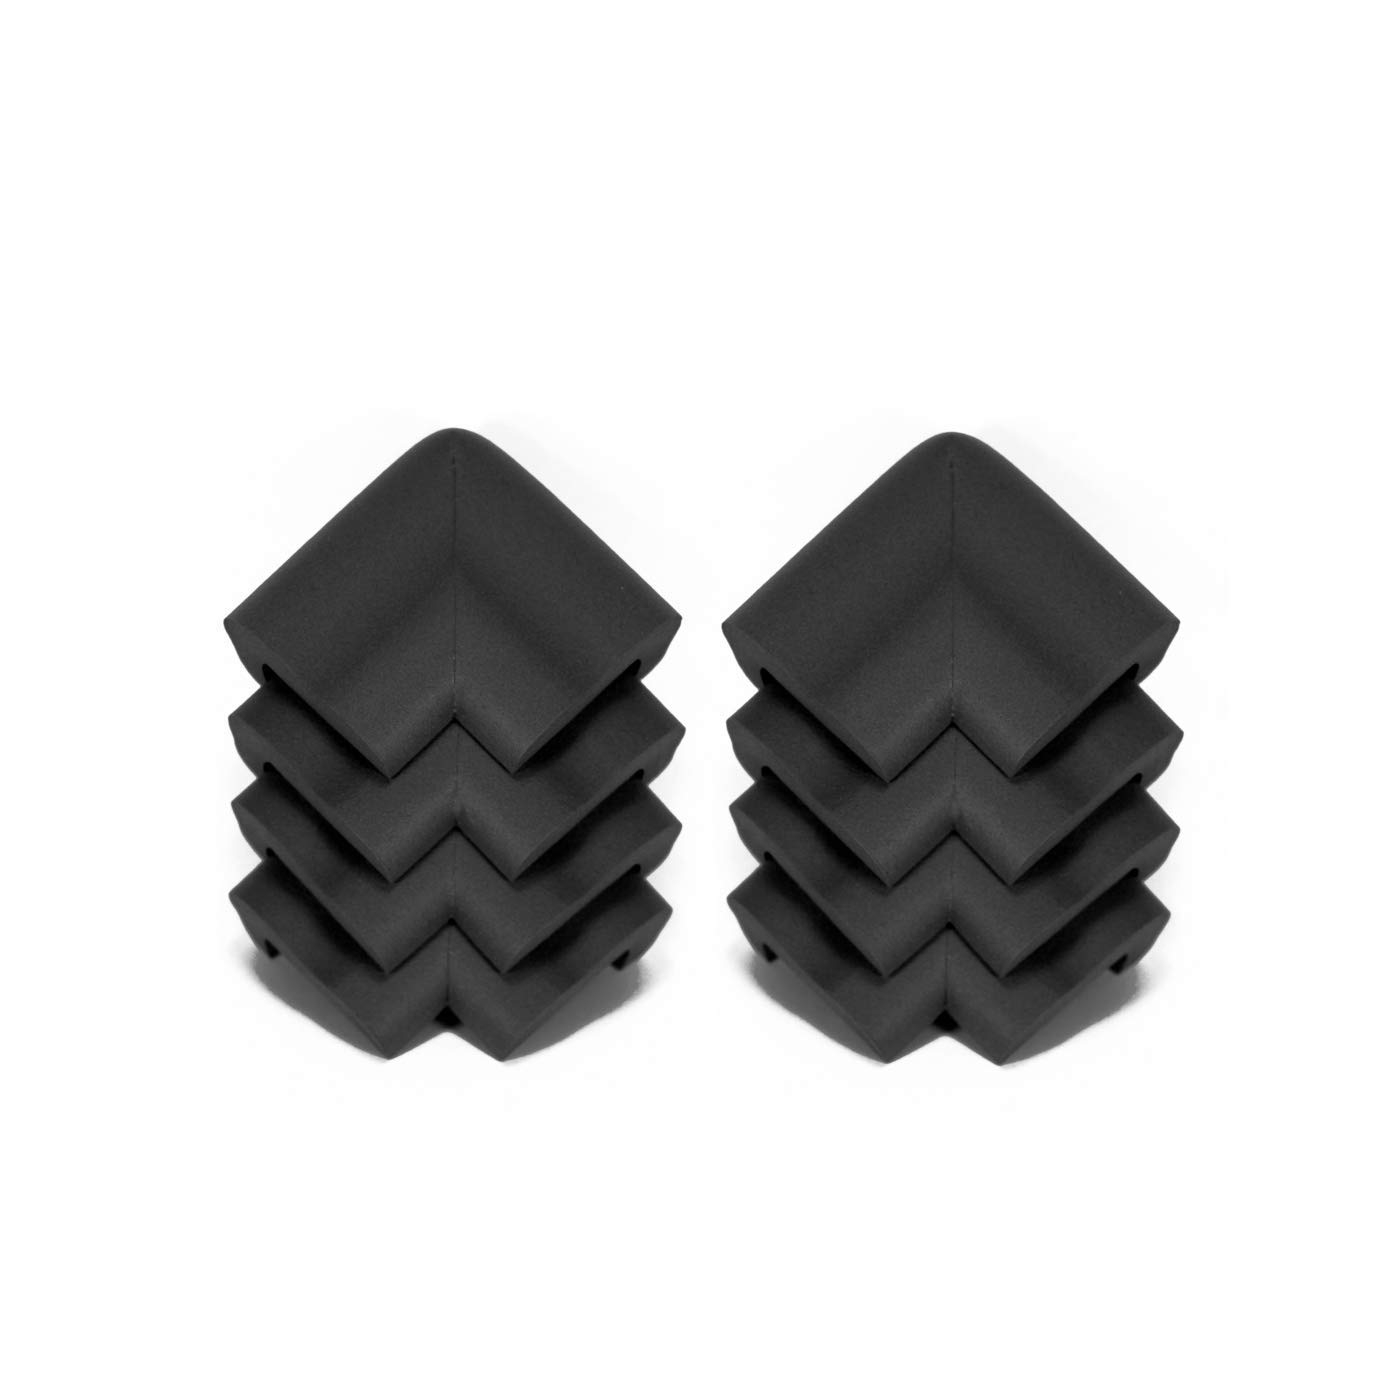 Kidkusion 8 Piece Jumbo Corner Guards, Black